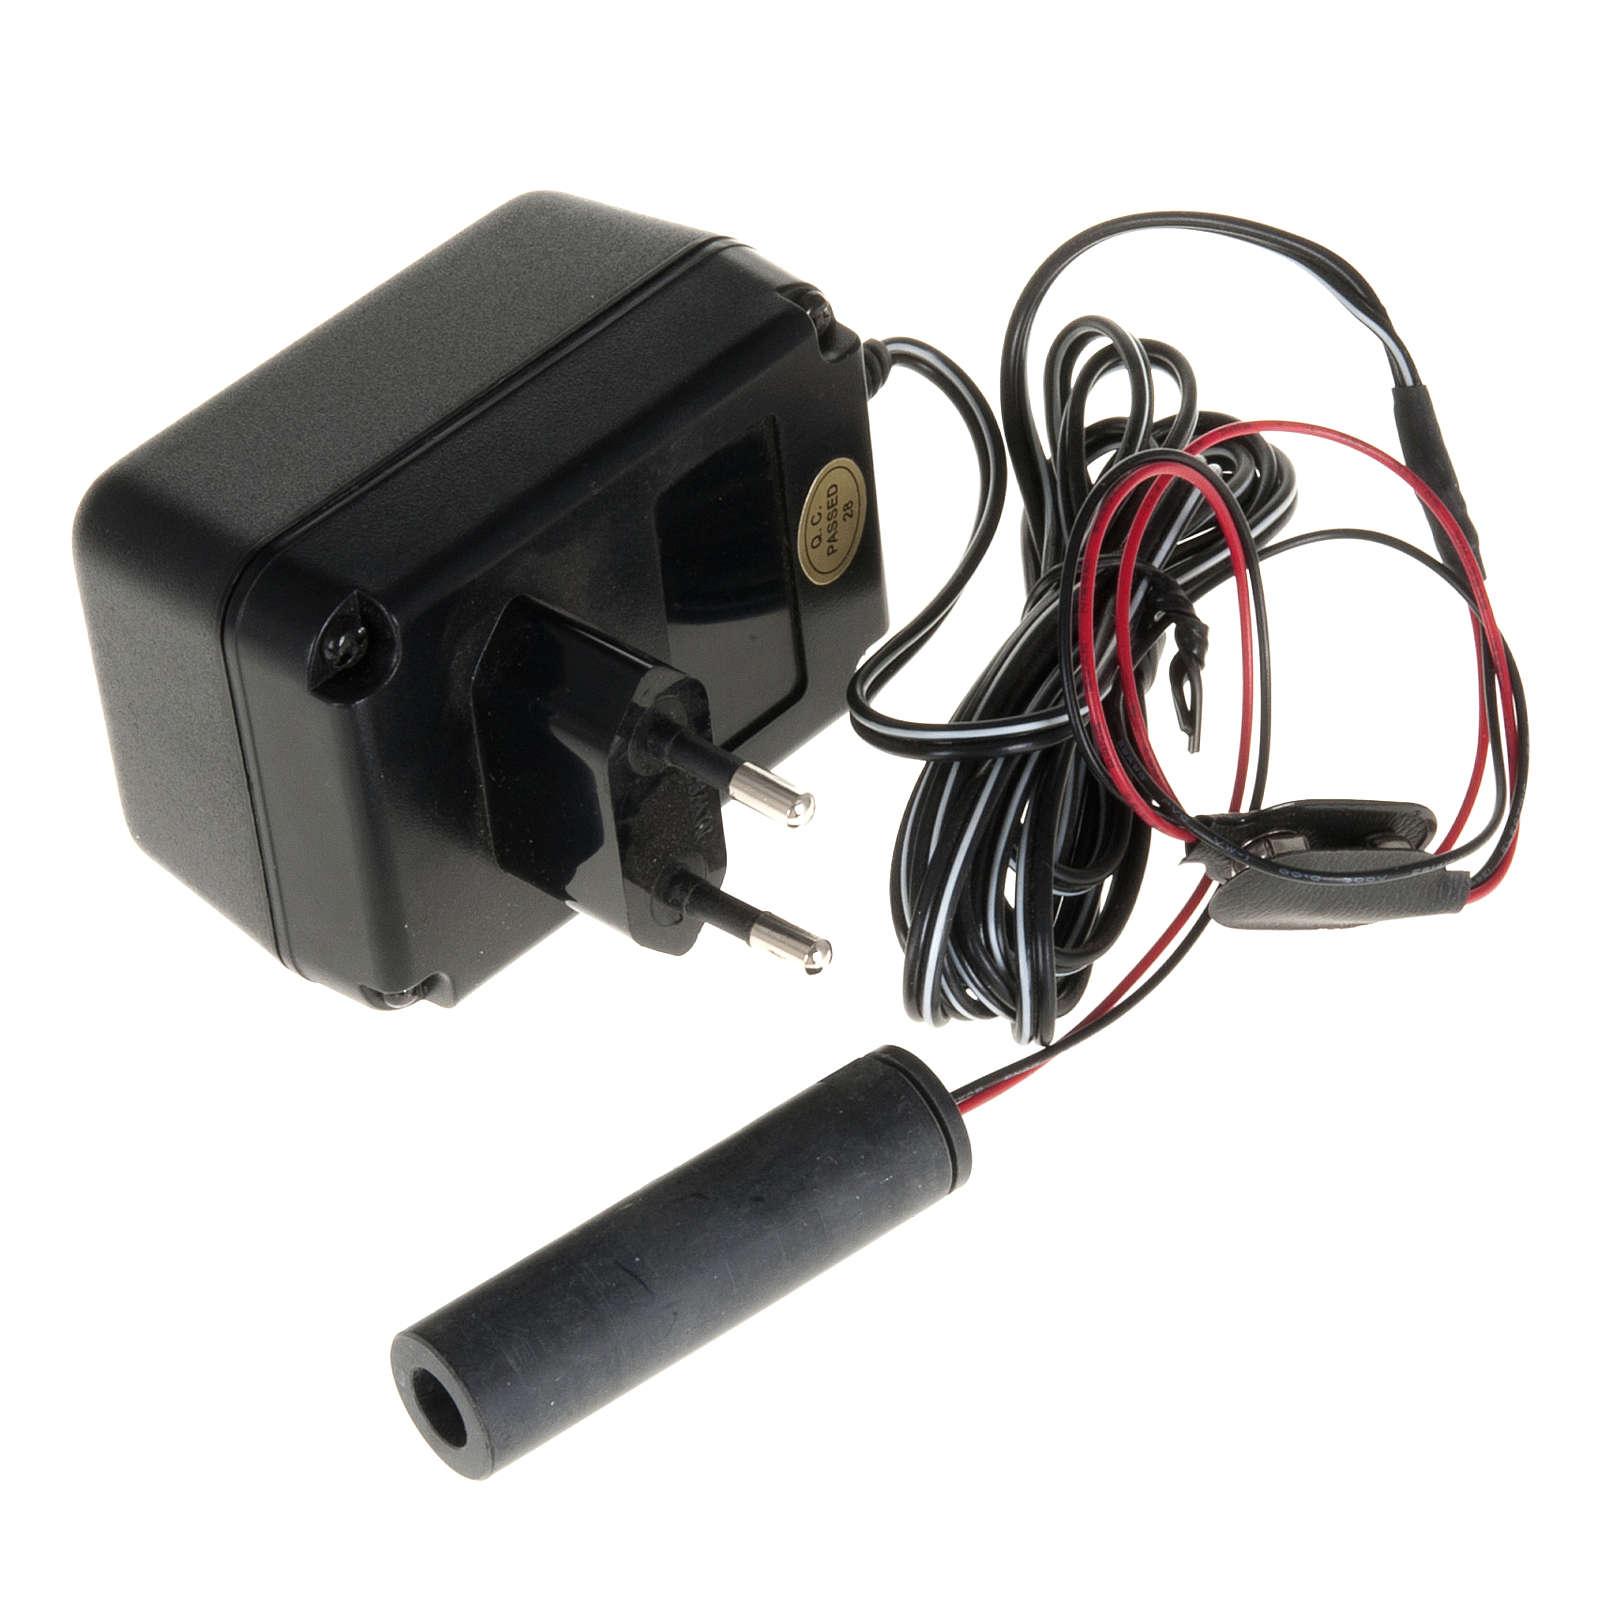 Fibra ottica presepe: generatore luce fissa 4